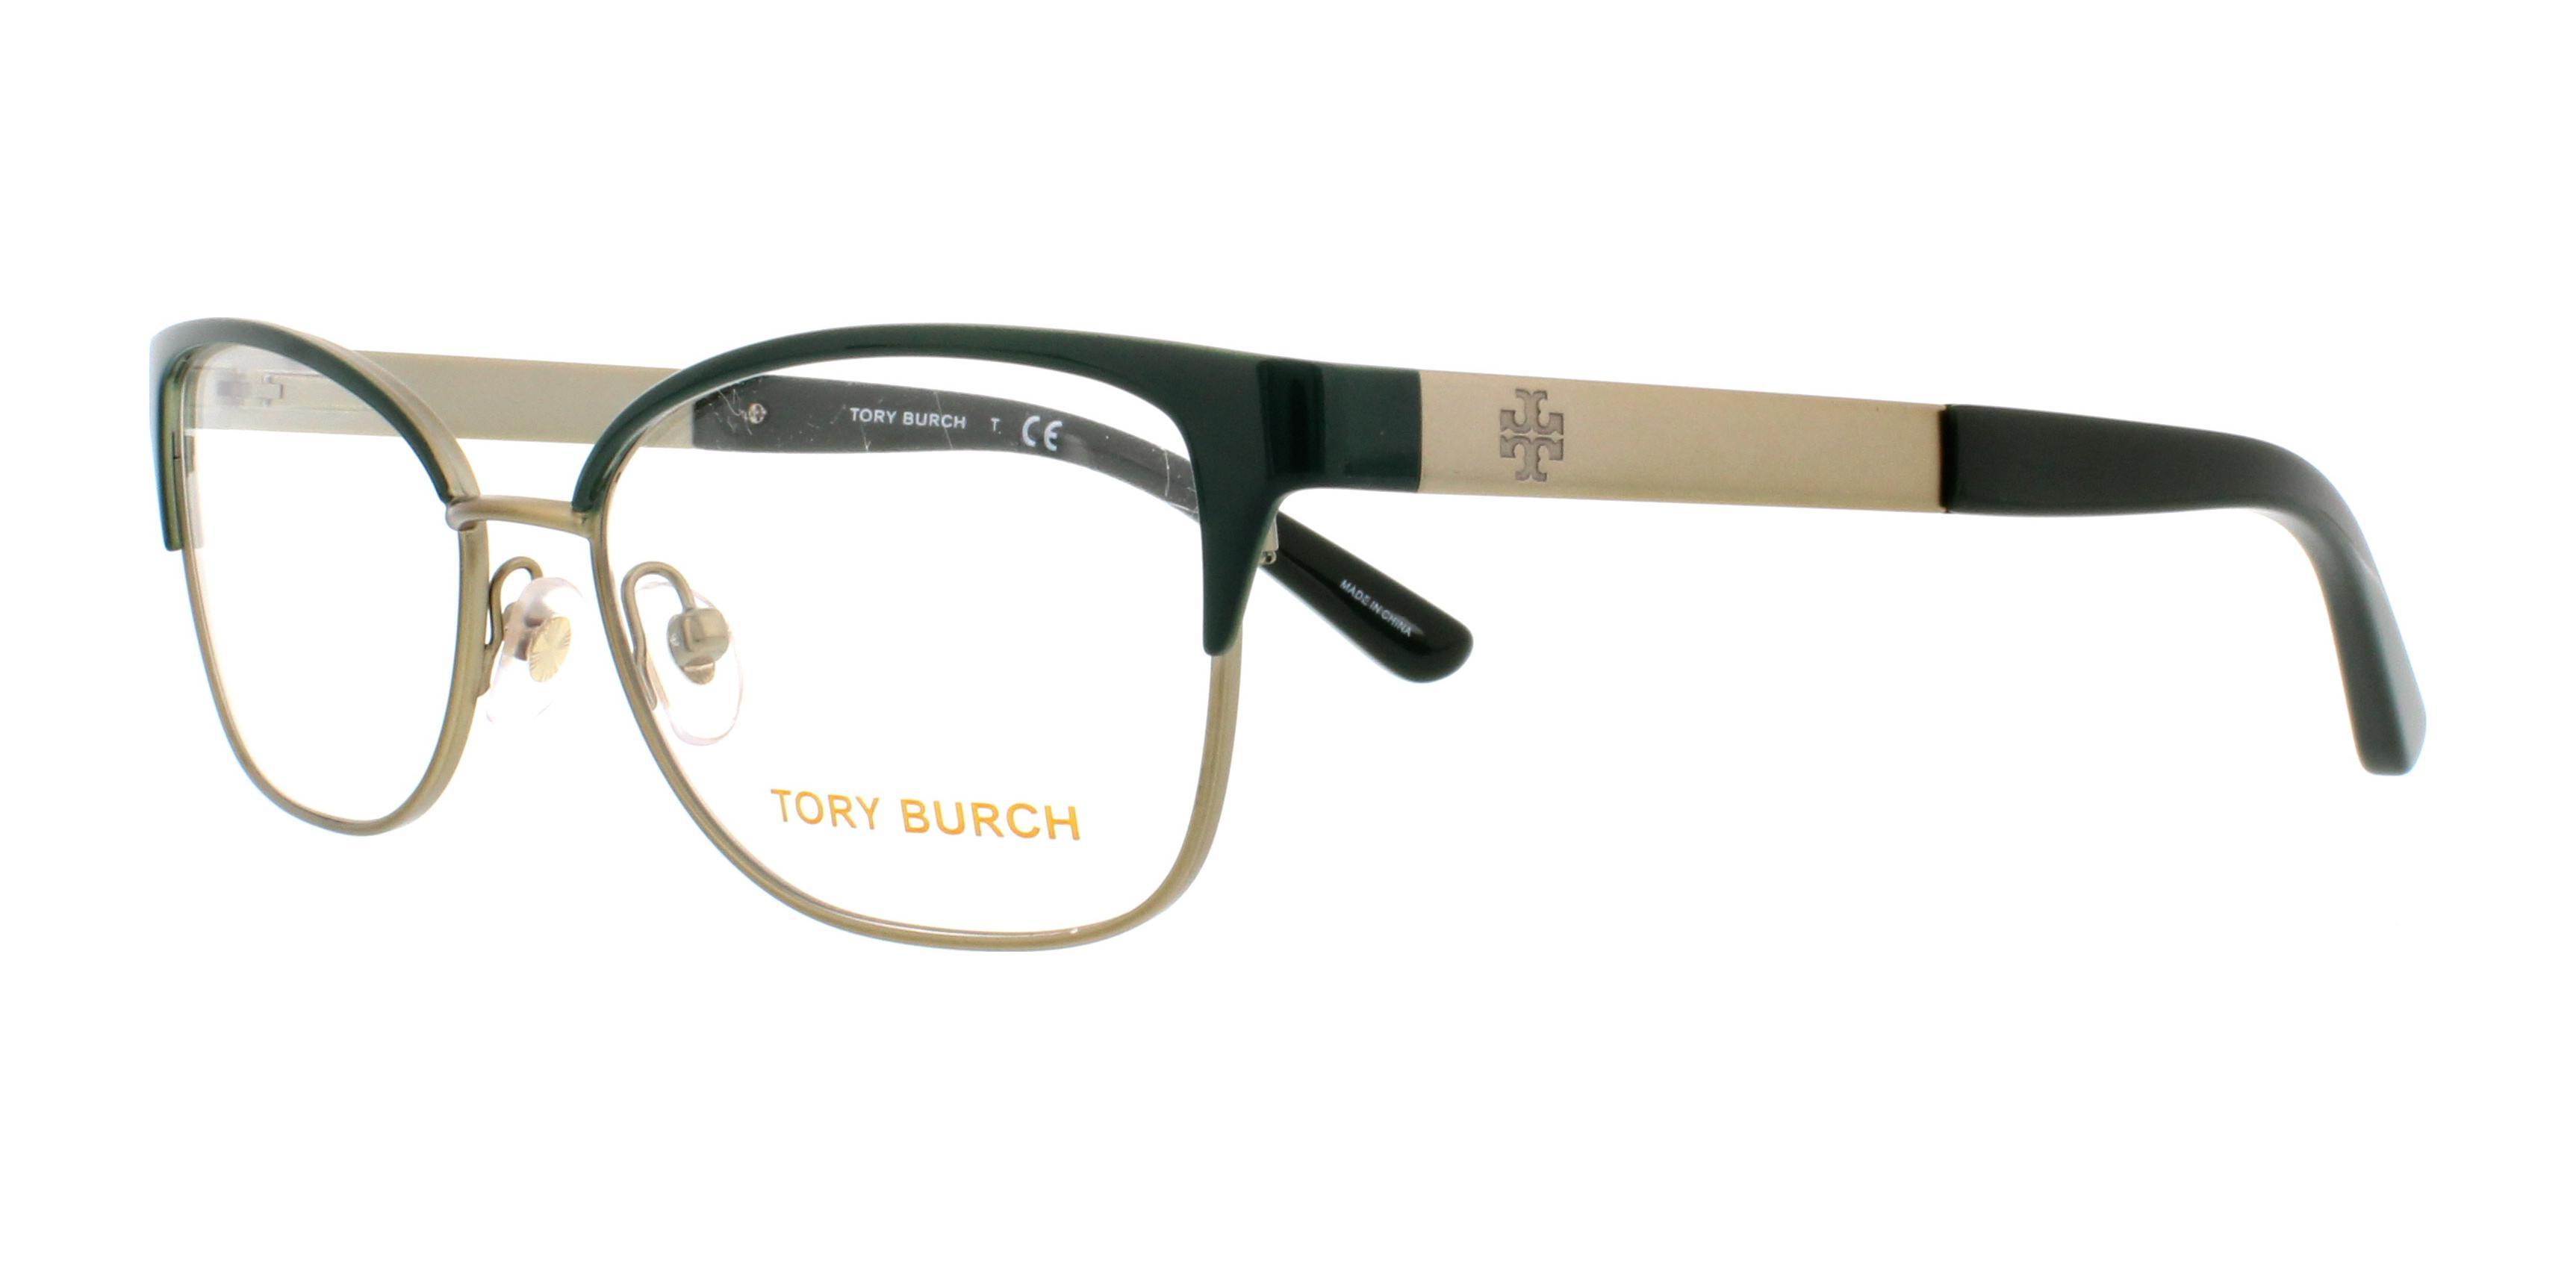 33b6a8370893 Designer Frames Outlet. Tory Burch TY1046